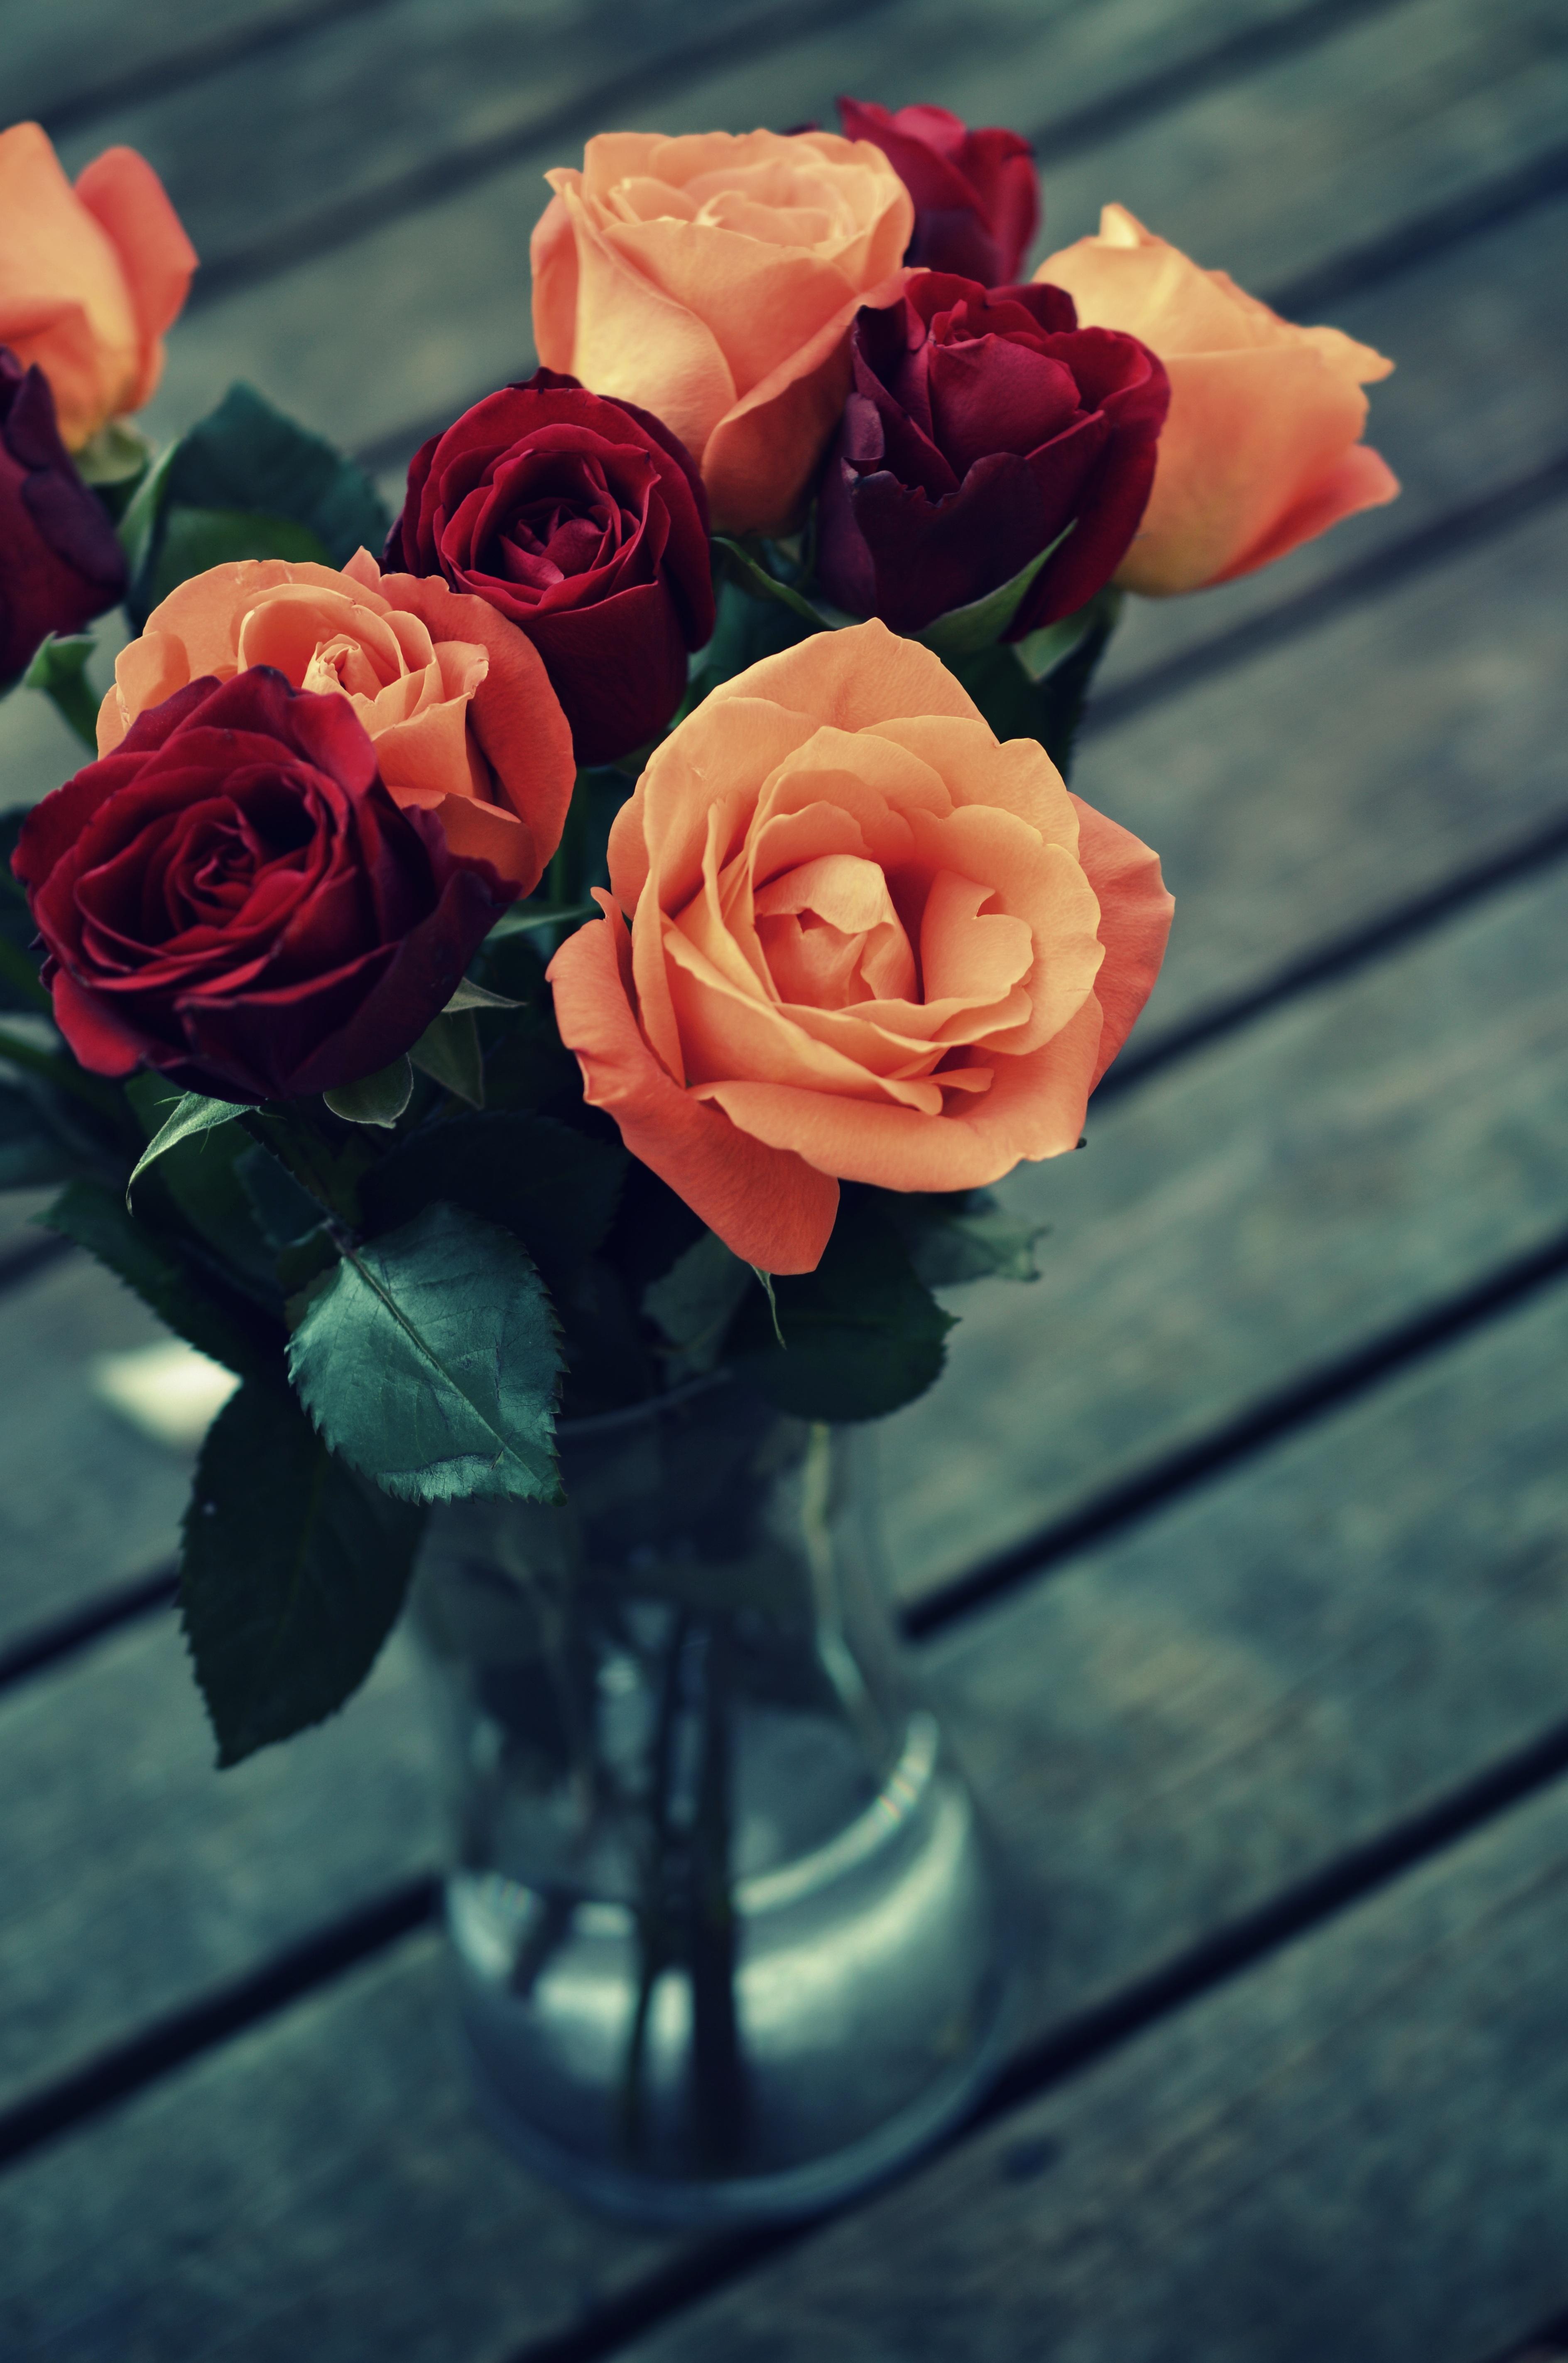 Gambar Alam Menanam Vintage Retro Daun Bunga Warna Berwarna Merah Muda Merapatkan Desain Budidaya Bunga Fotografi Makro Tanaman Berbunga Mawar Taman Keluarga Mawar Buket Bunga Tanaman Tanah 3776x5691 Monika Stawowy